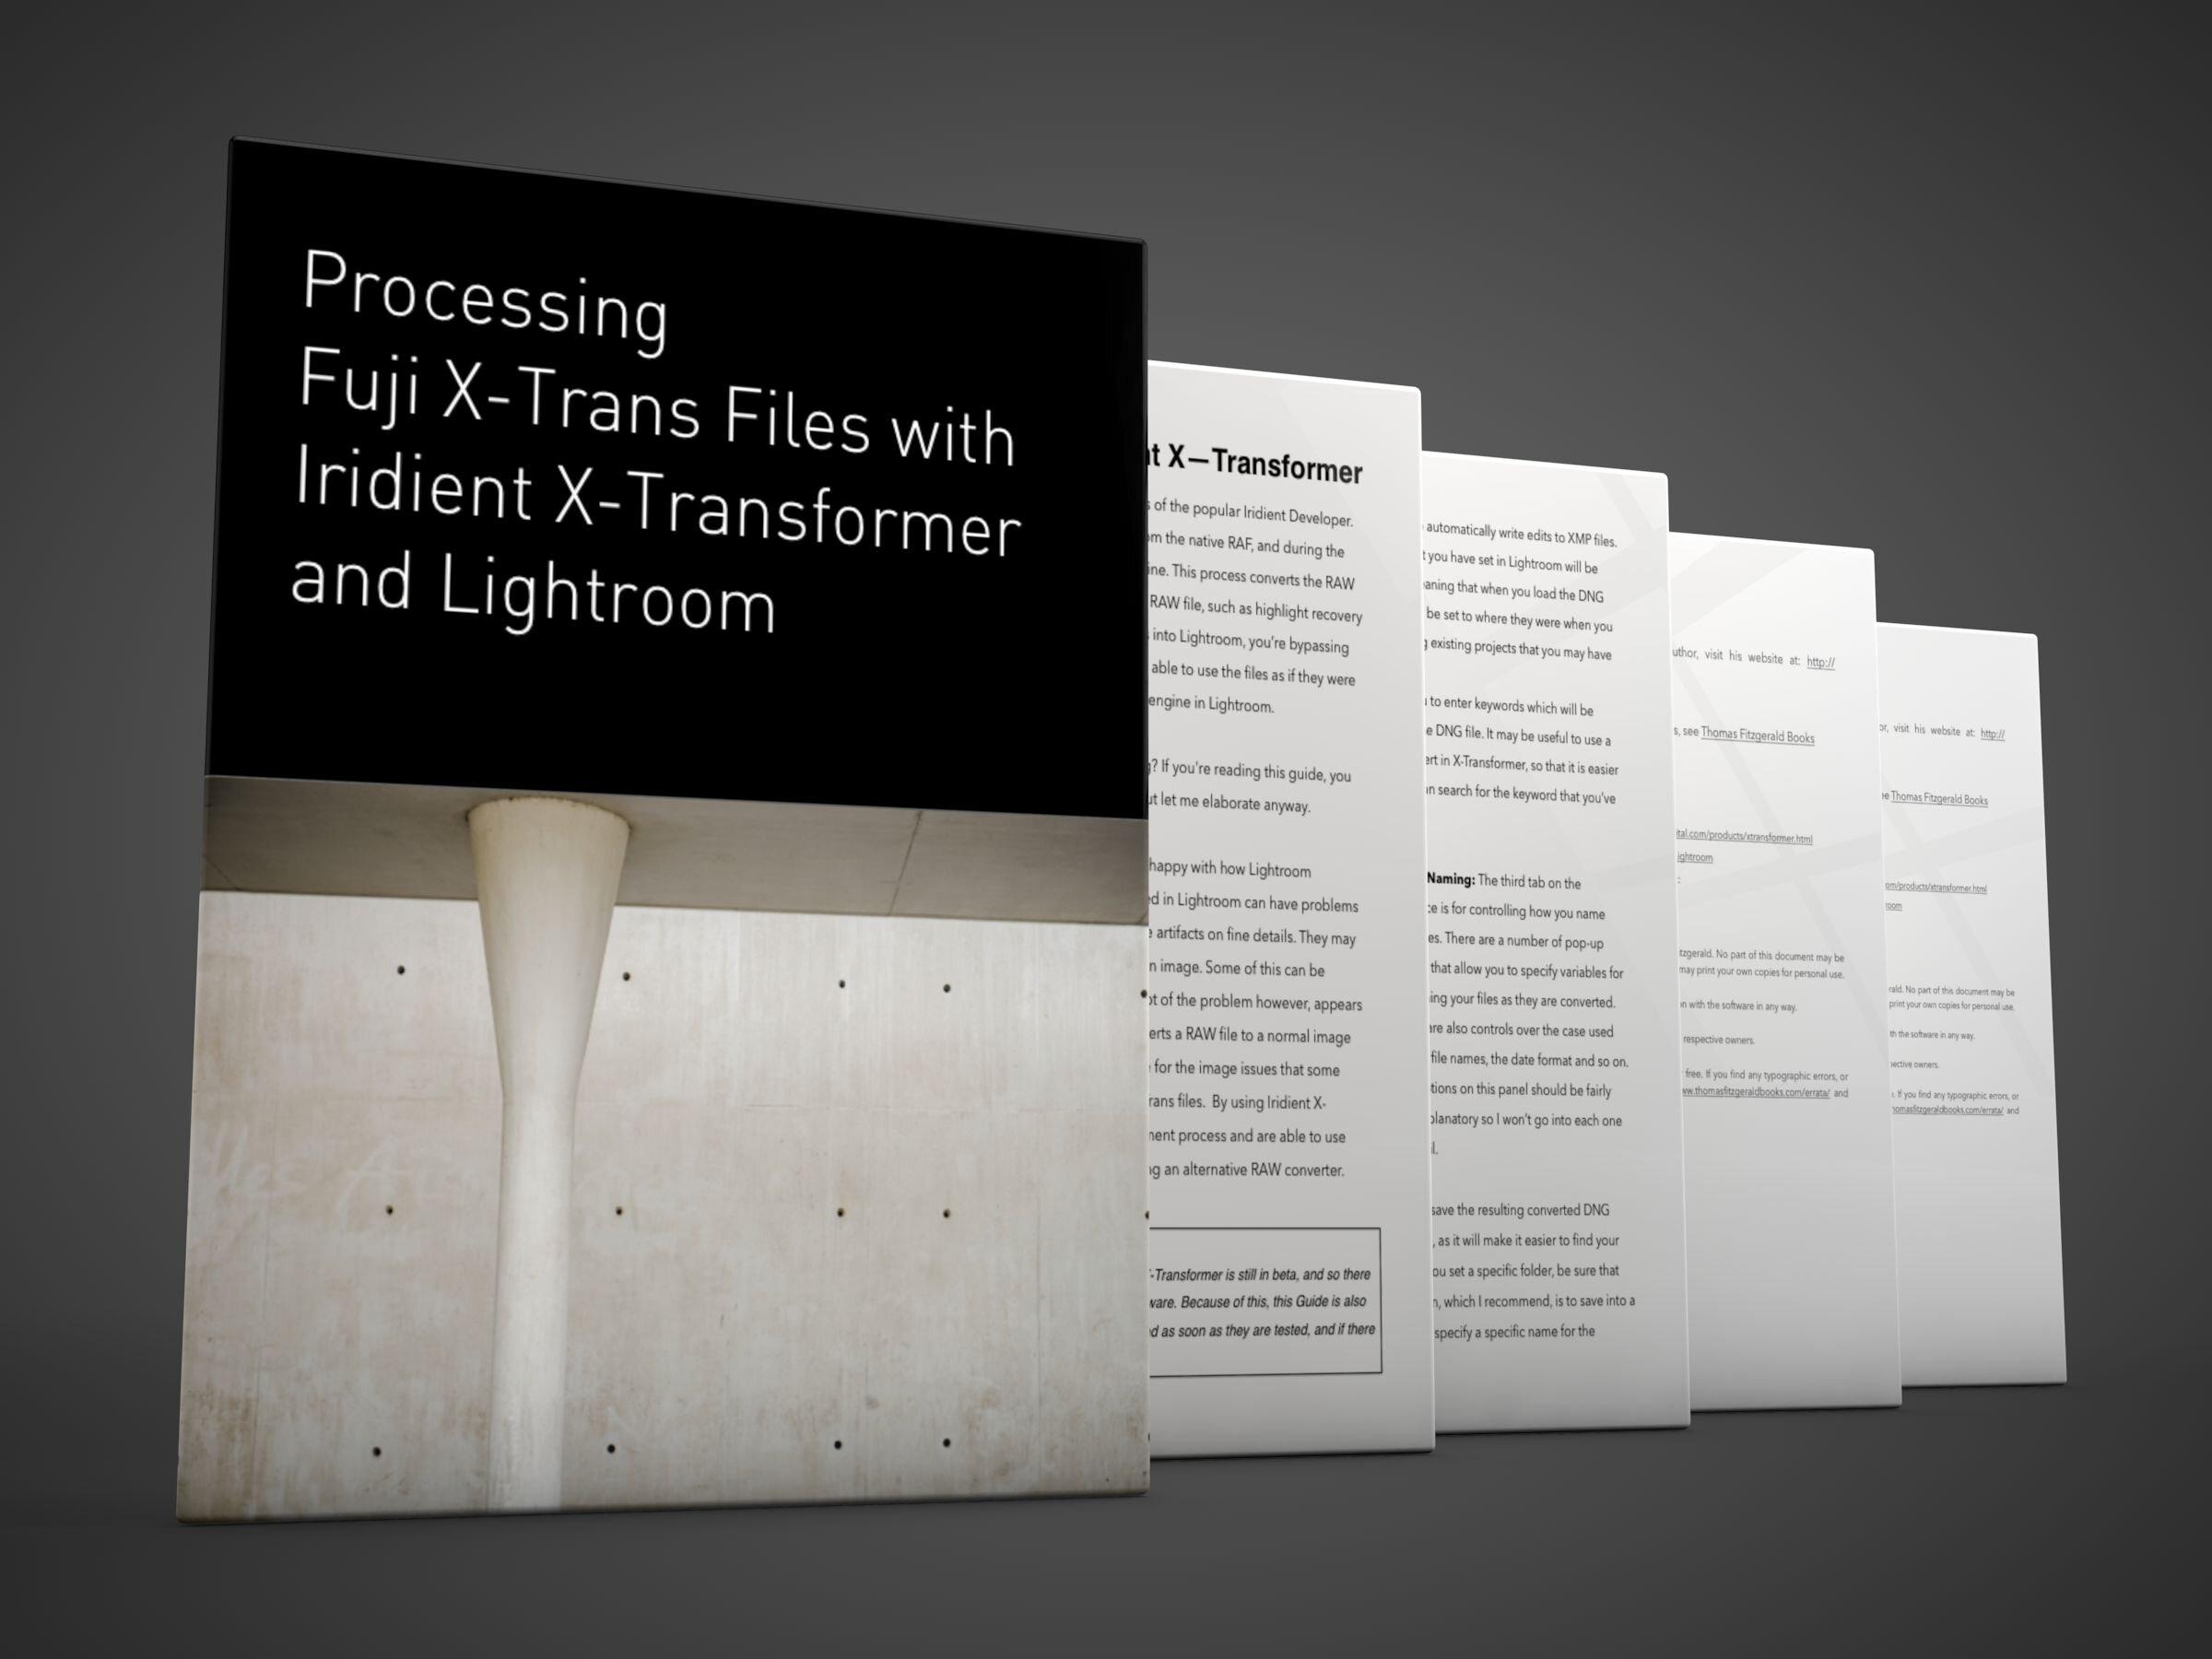 Processing Fuji Raw files with Iridient X-Transformer